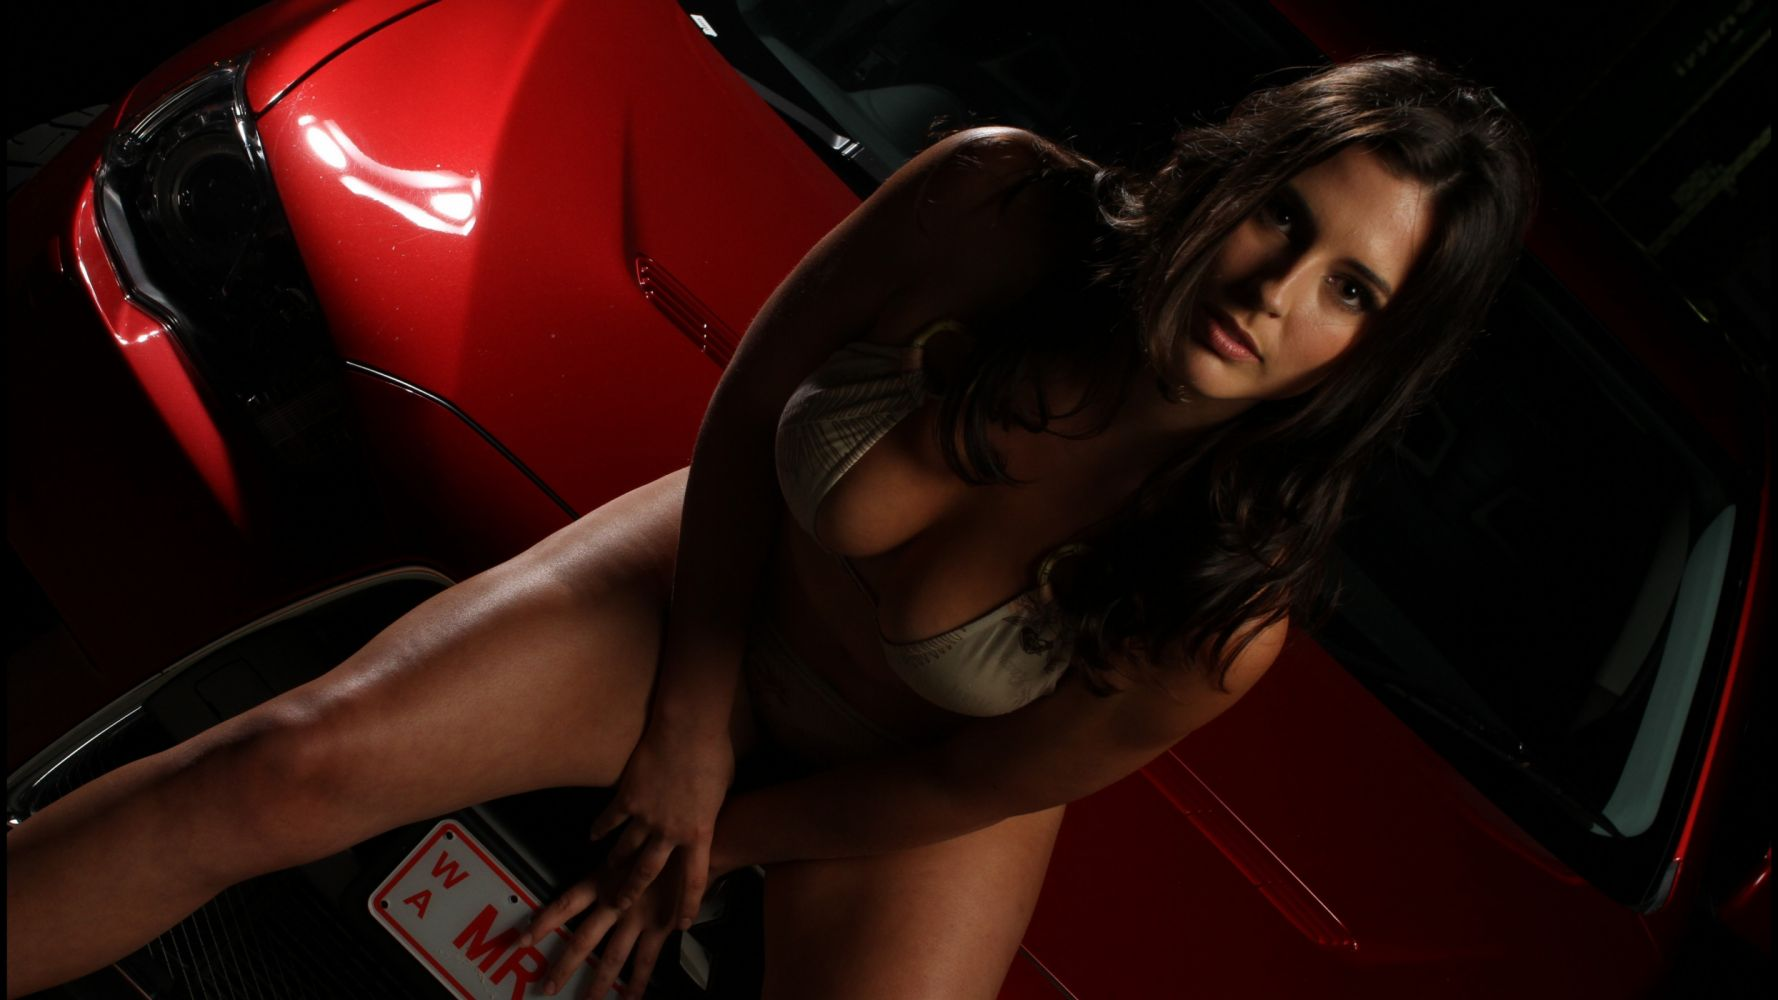 Photography sexy hot women cars automotive dream